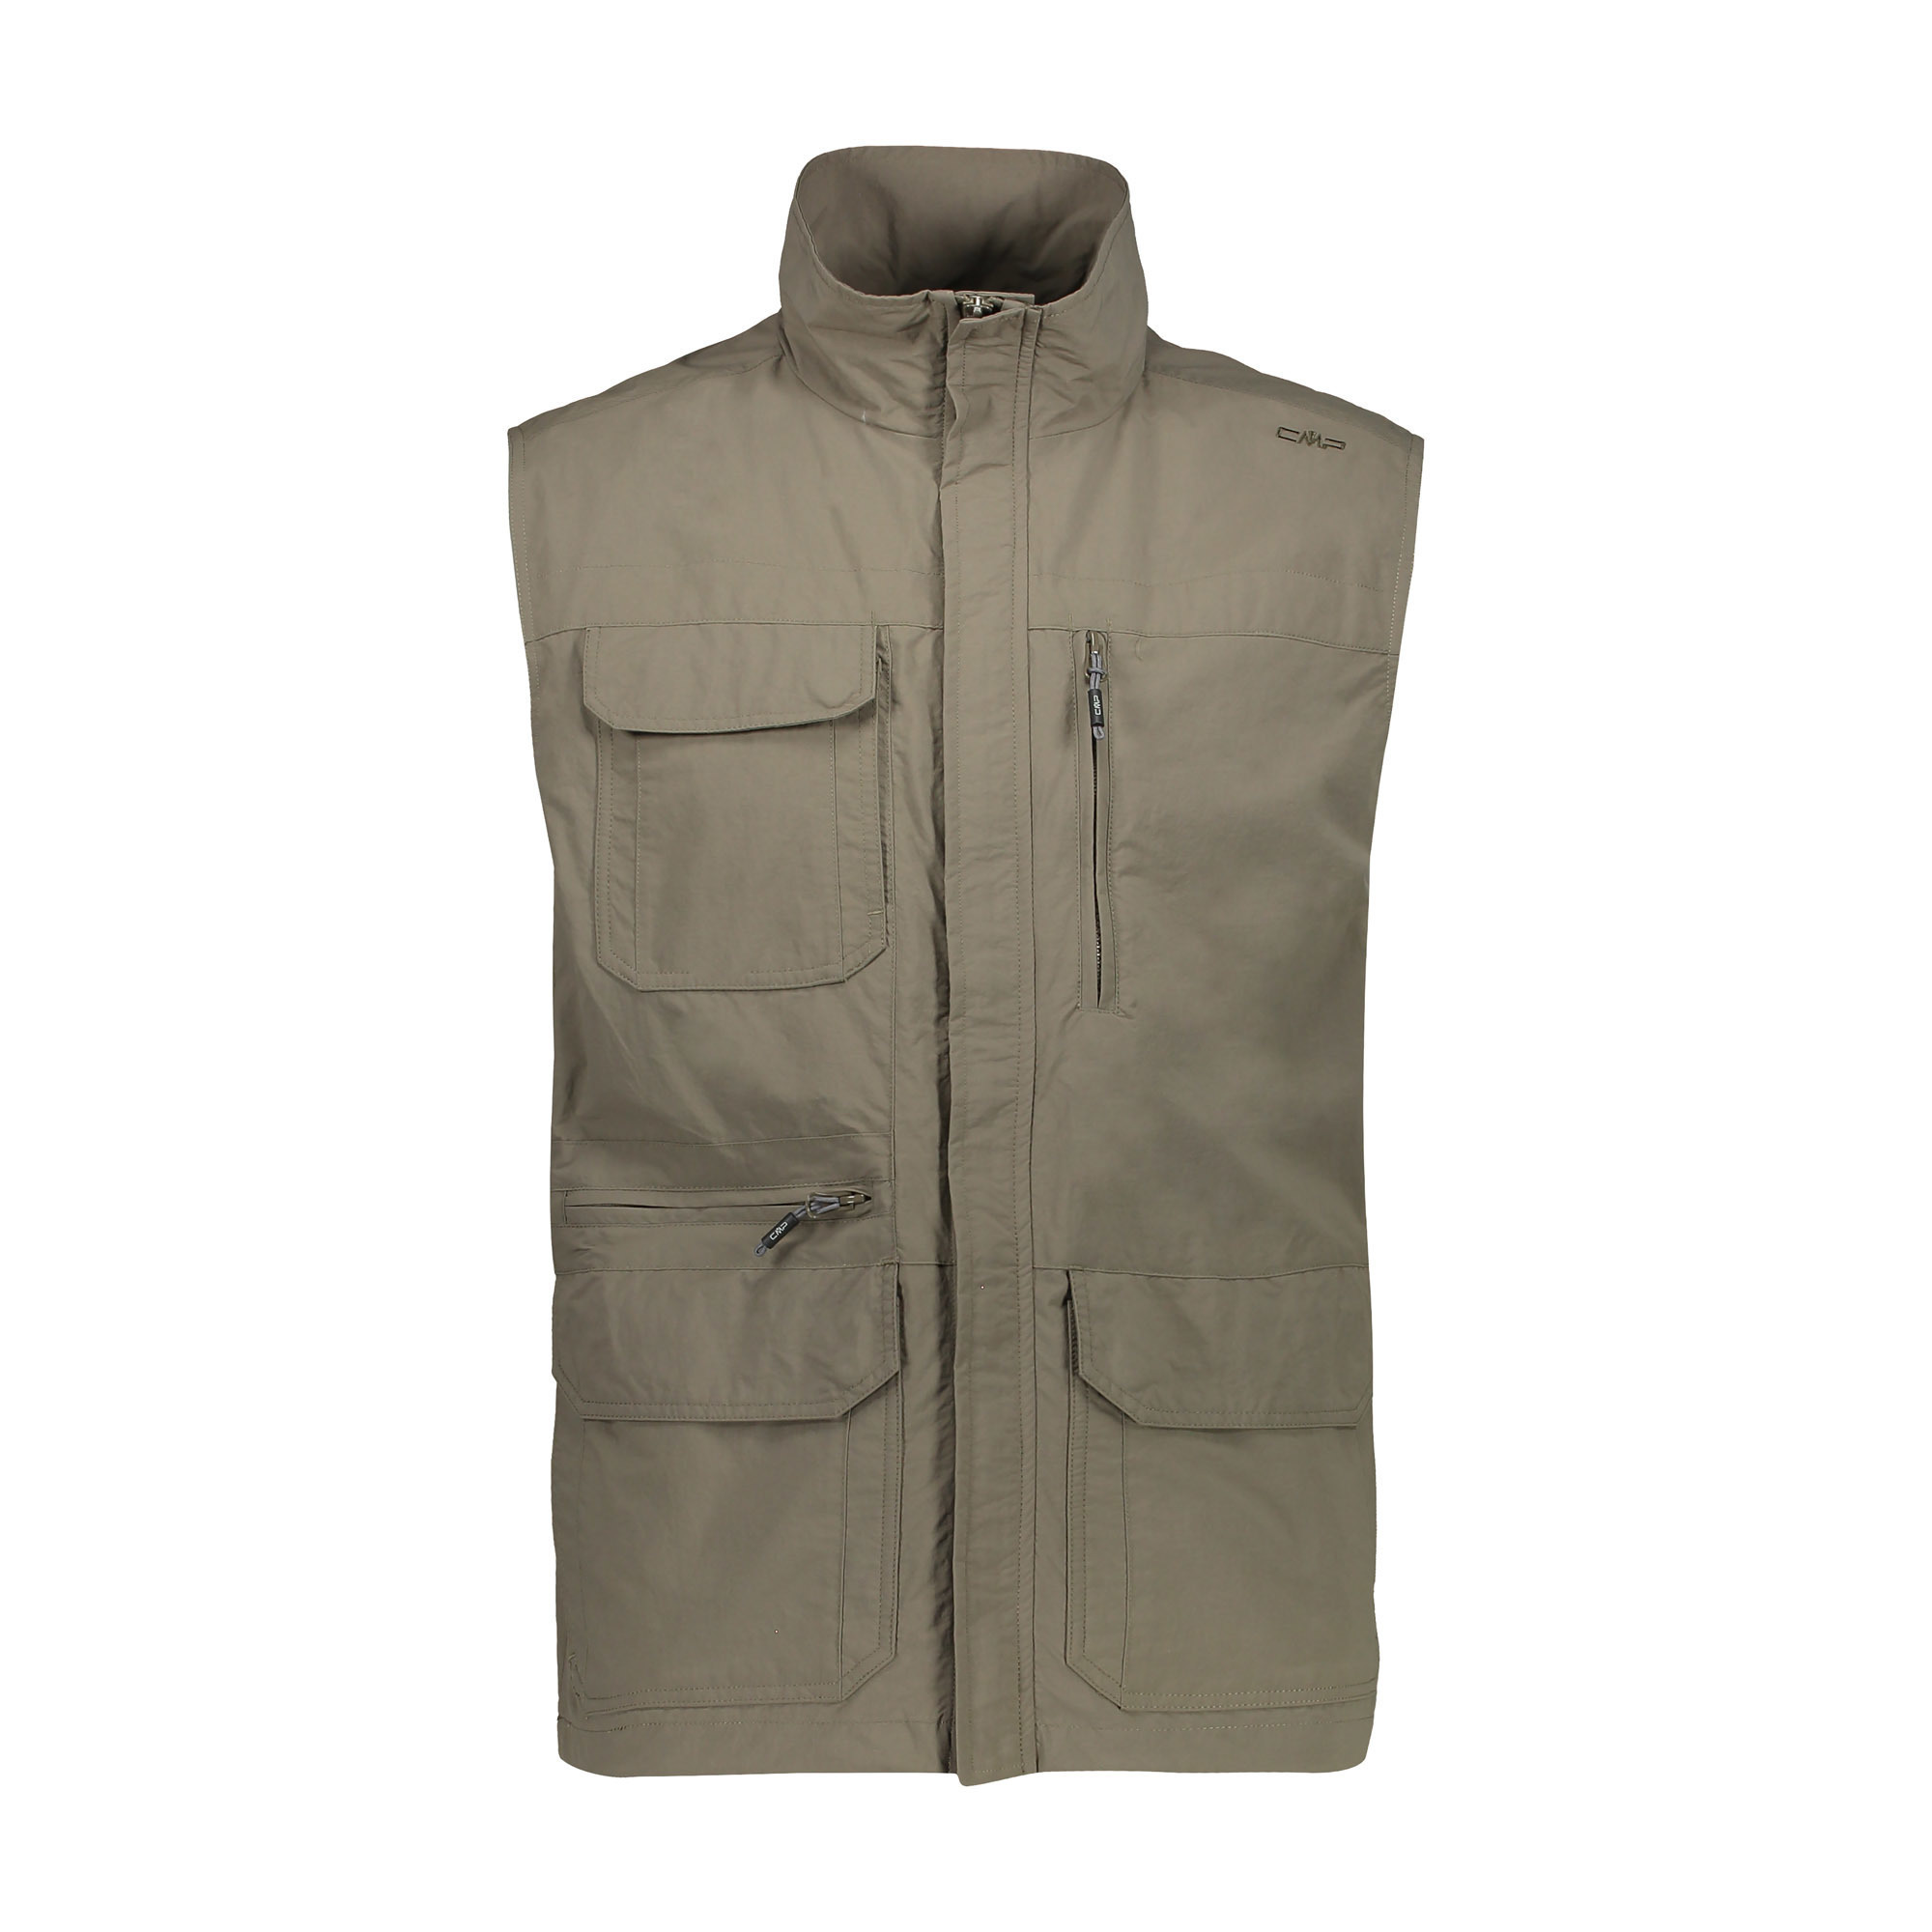 Dry Function Vest